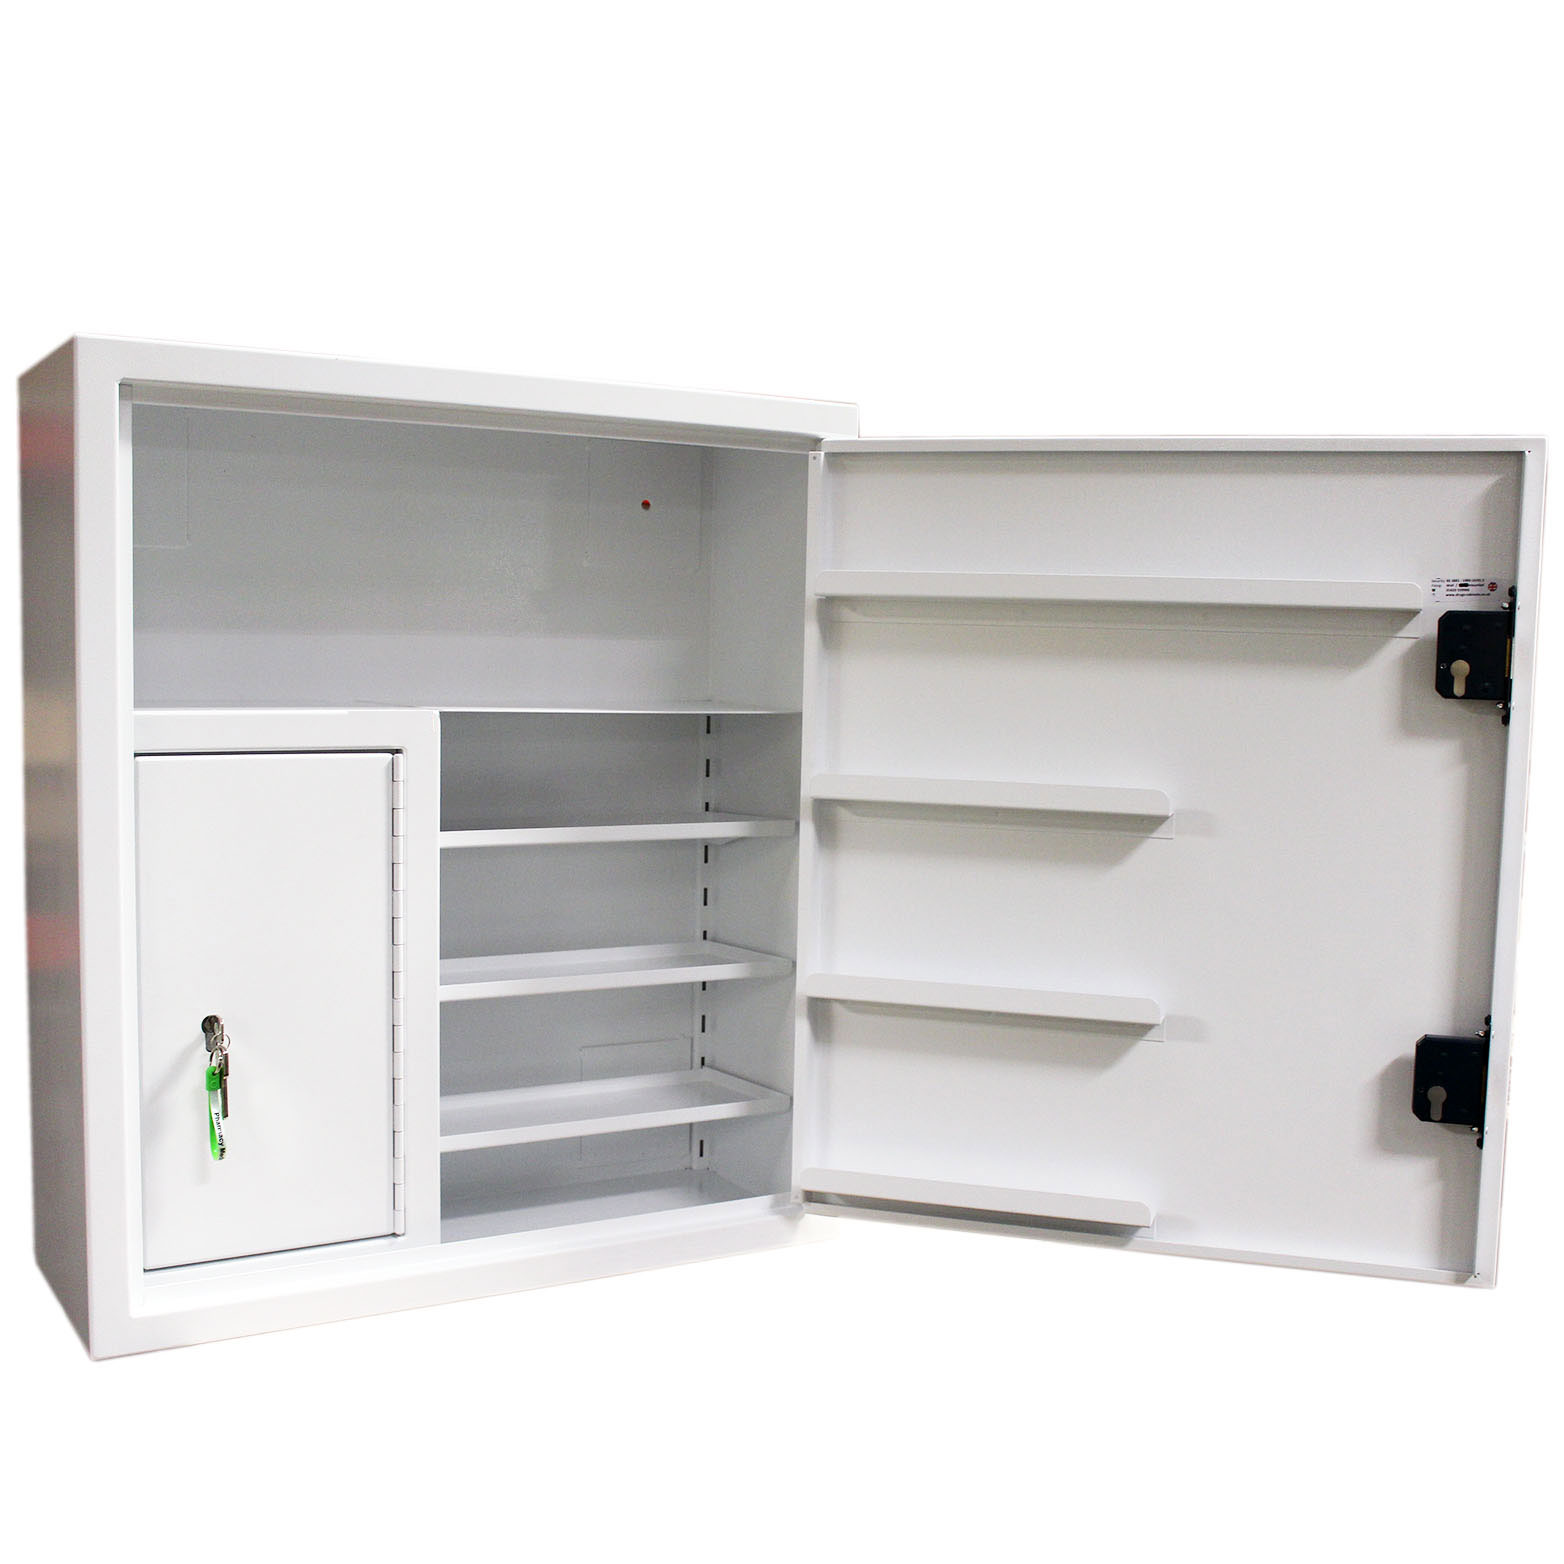 FPD 11292 drug cupboard with inner closed door